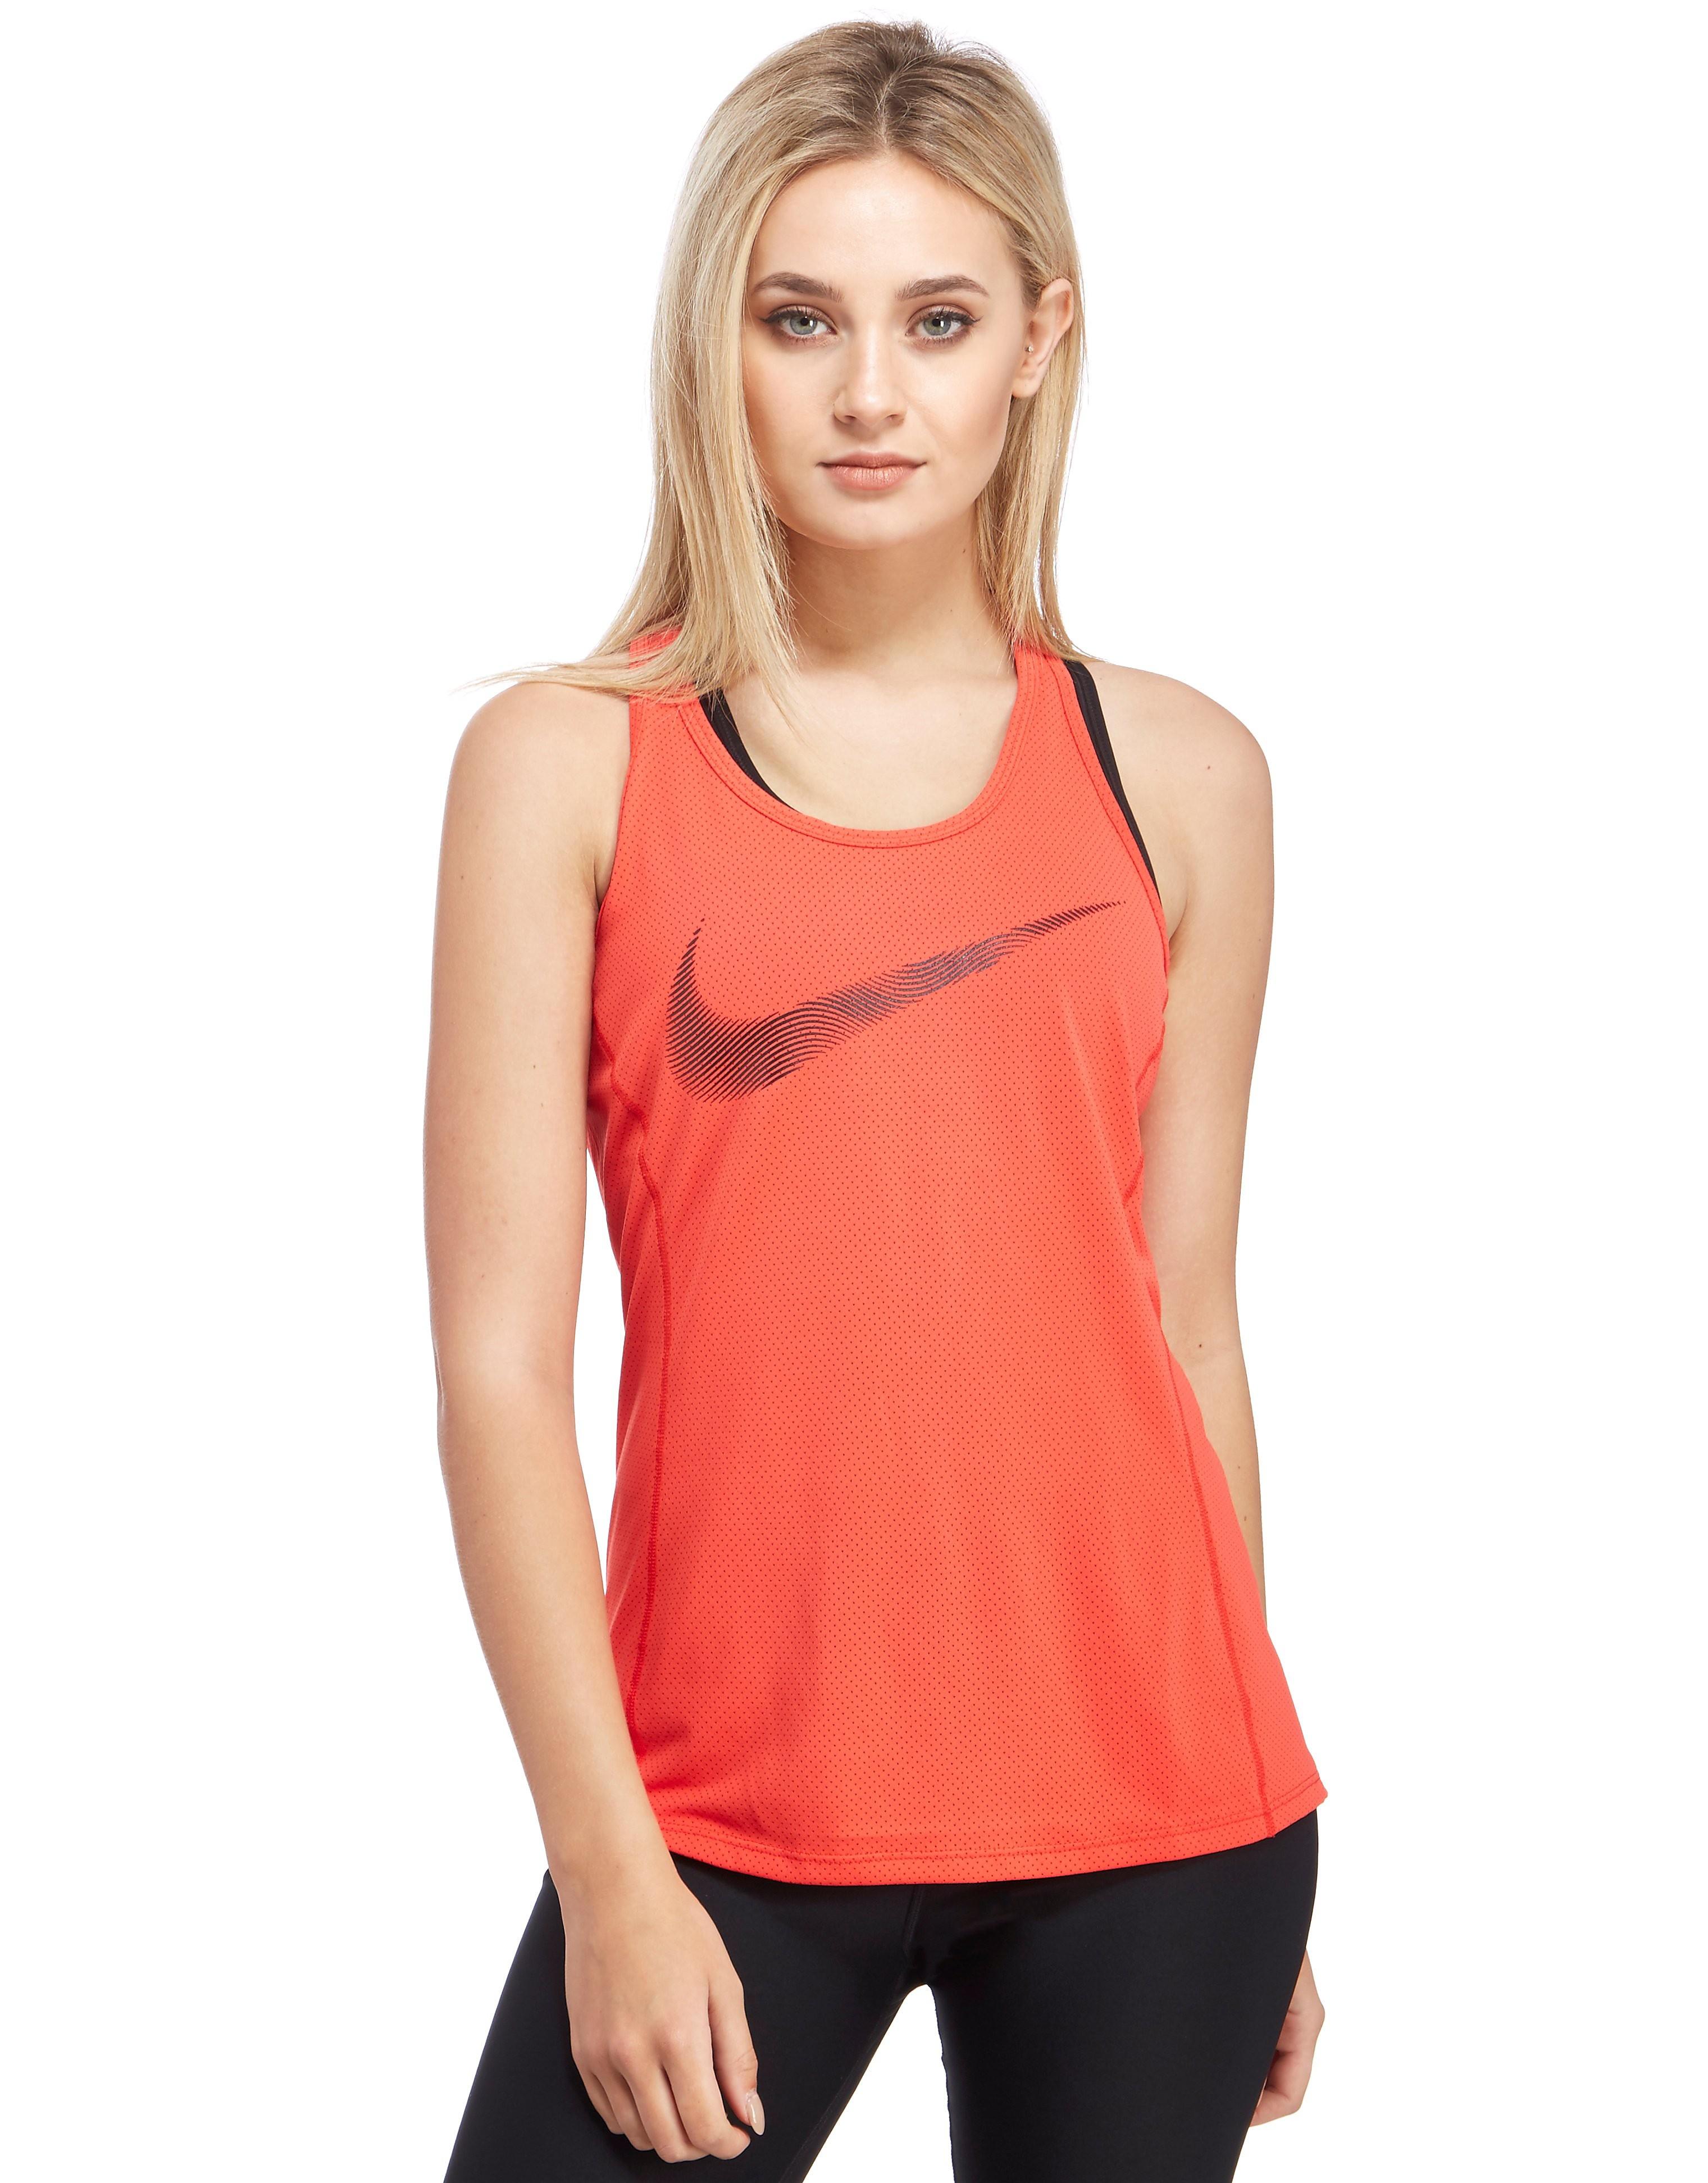 Nike Contour Swoosh Tank Top